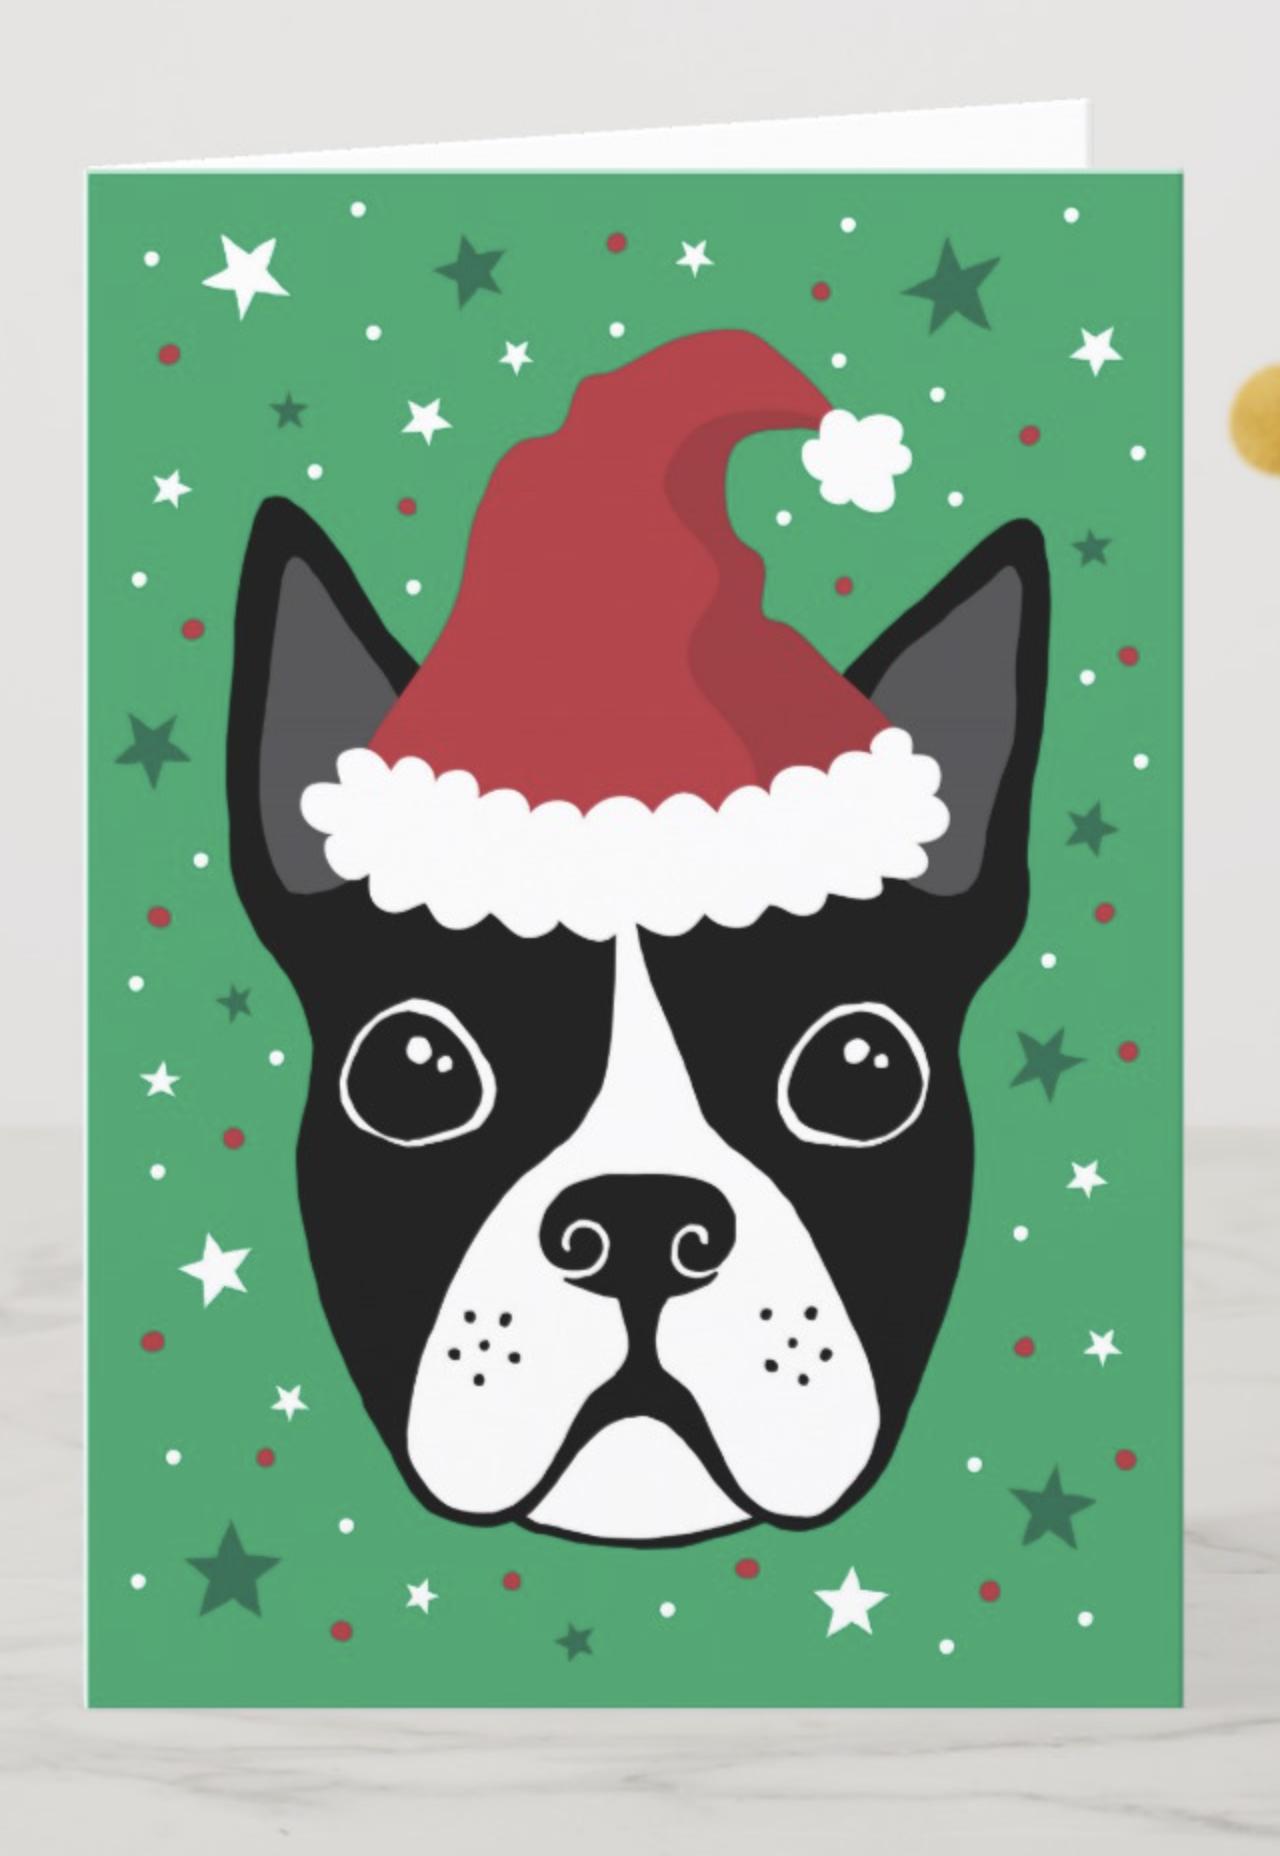 Boston Terrier Christmas Card Dog Wearing Santa Zazzle Com In 2020 Boston Terrier Christmas Card Dog Christmas Card Boston Terrier Christmas